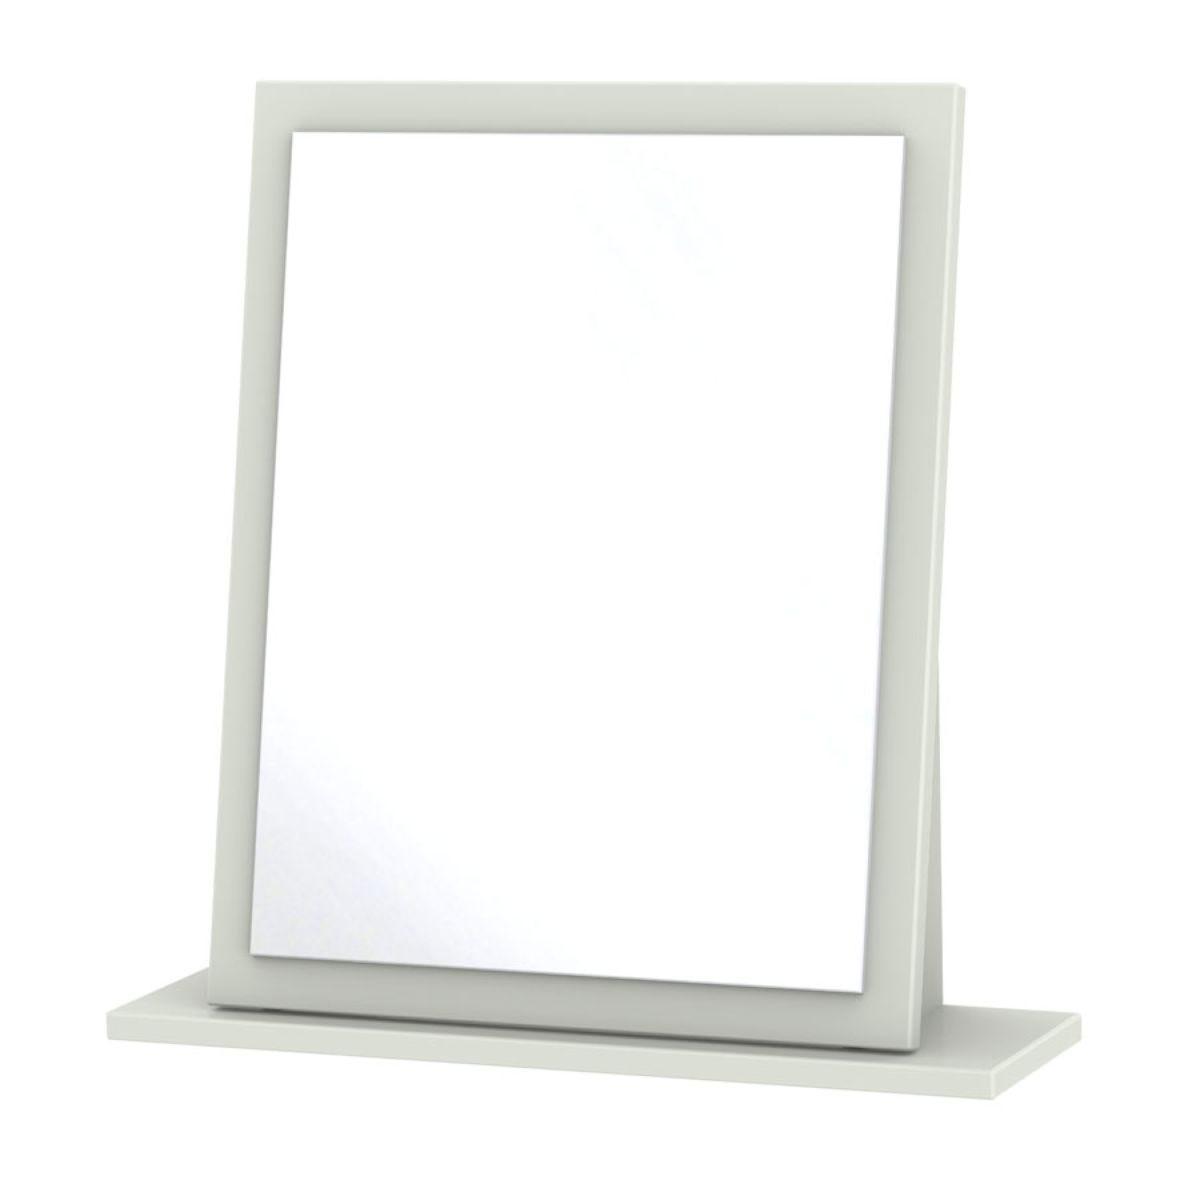 Indices Small Vanity Mirror - White